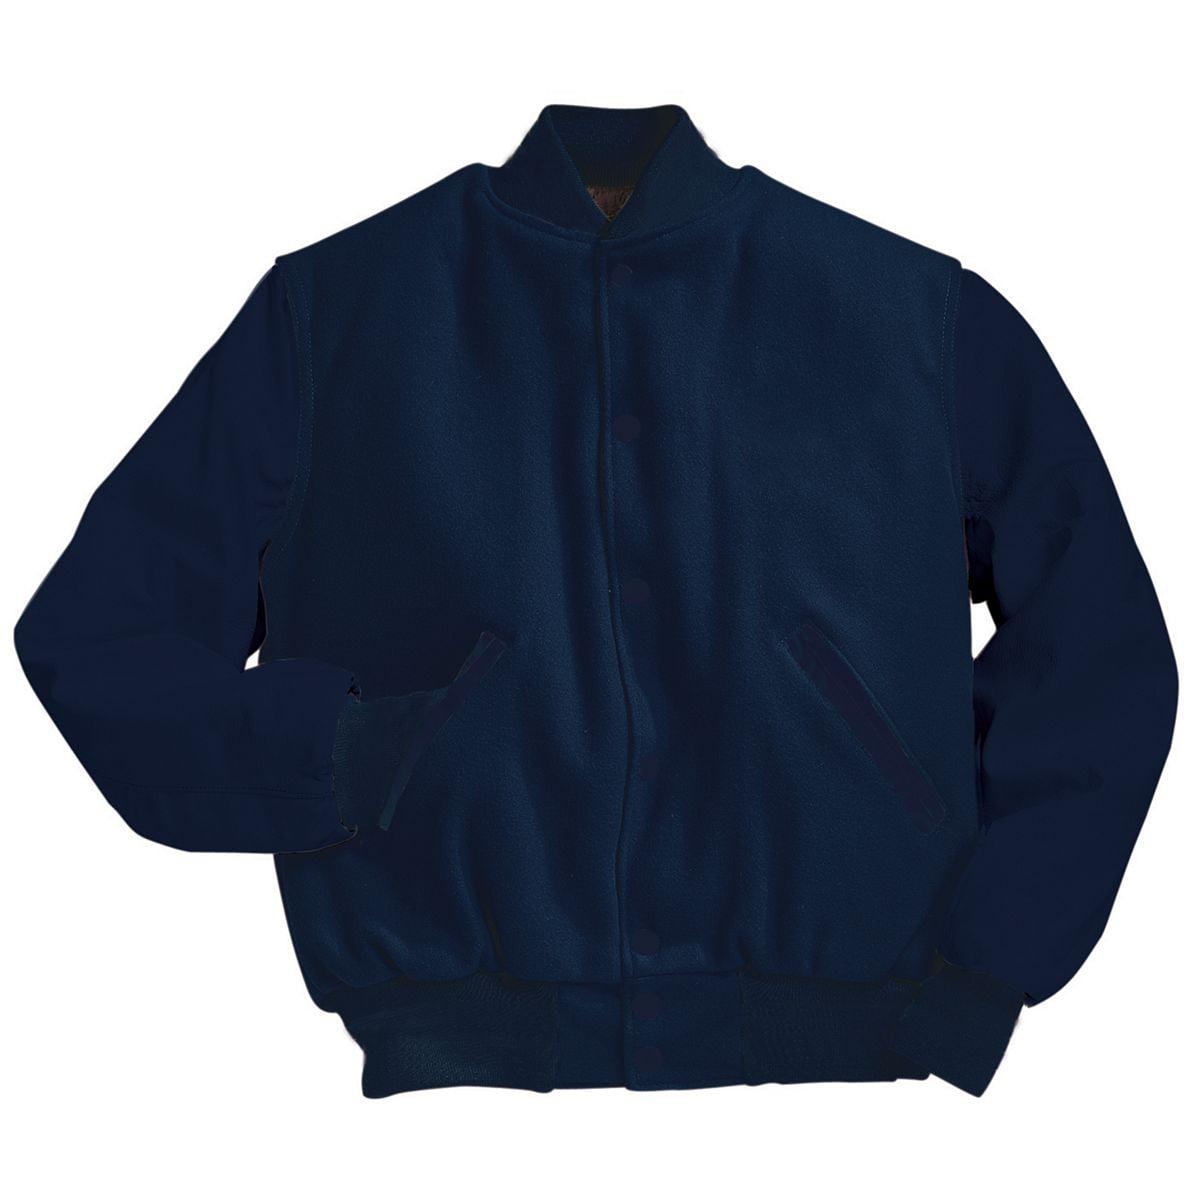 Holloway Varsity Tall Wool Jacket Black 3Xl - image 1 of 1